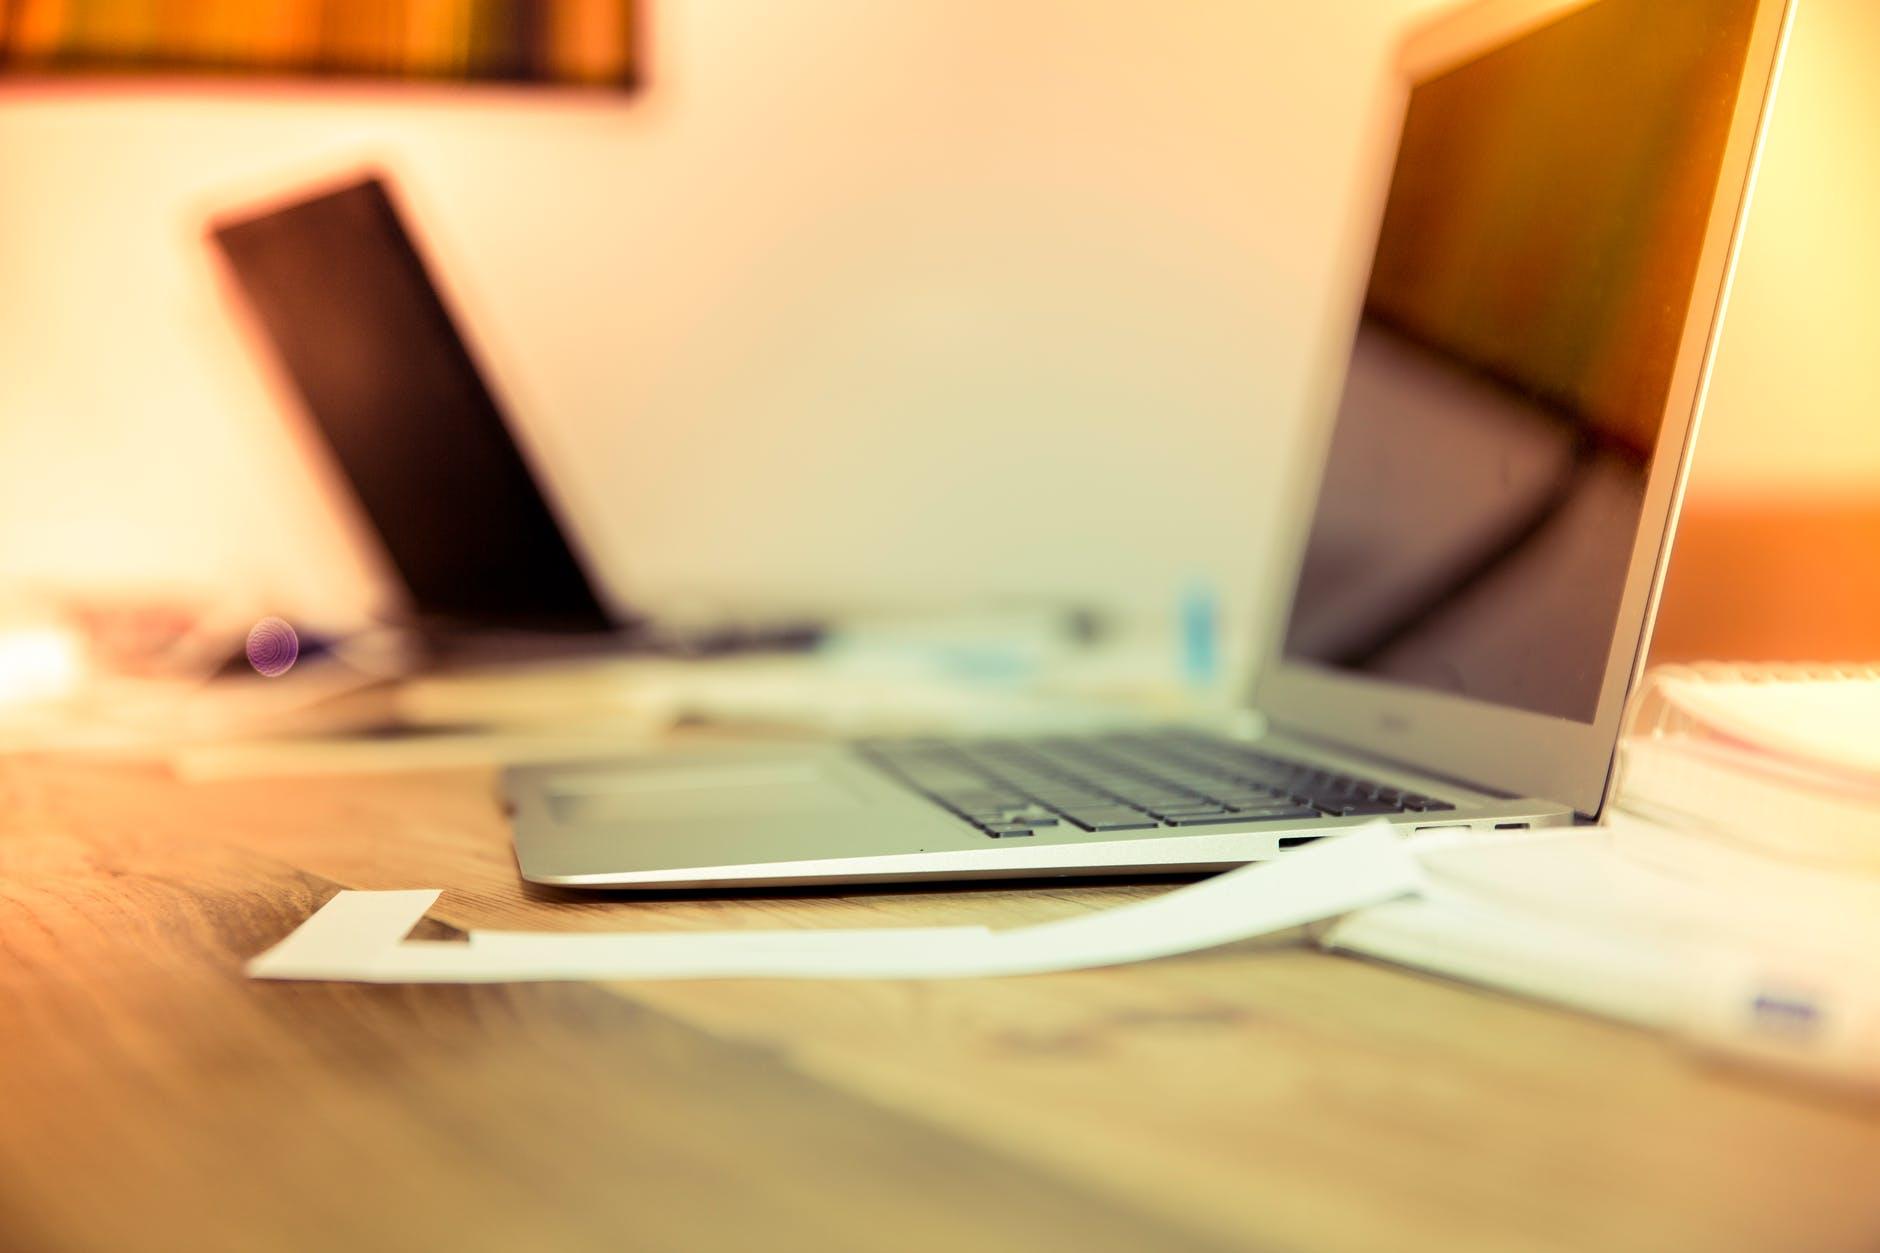 creative desk laptop notebook